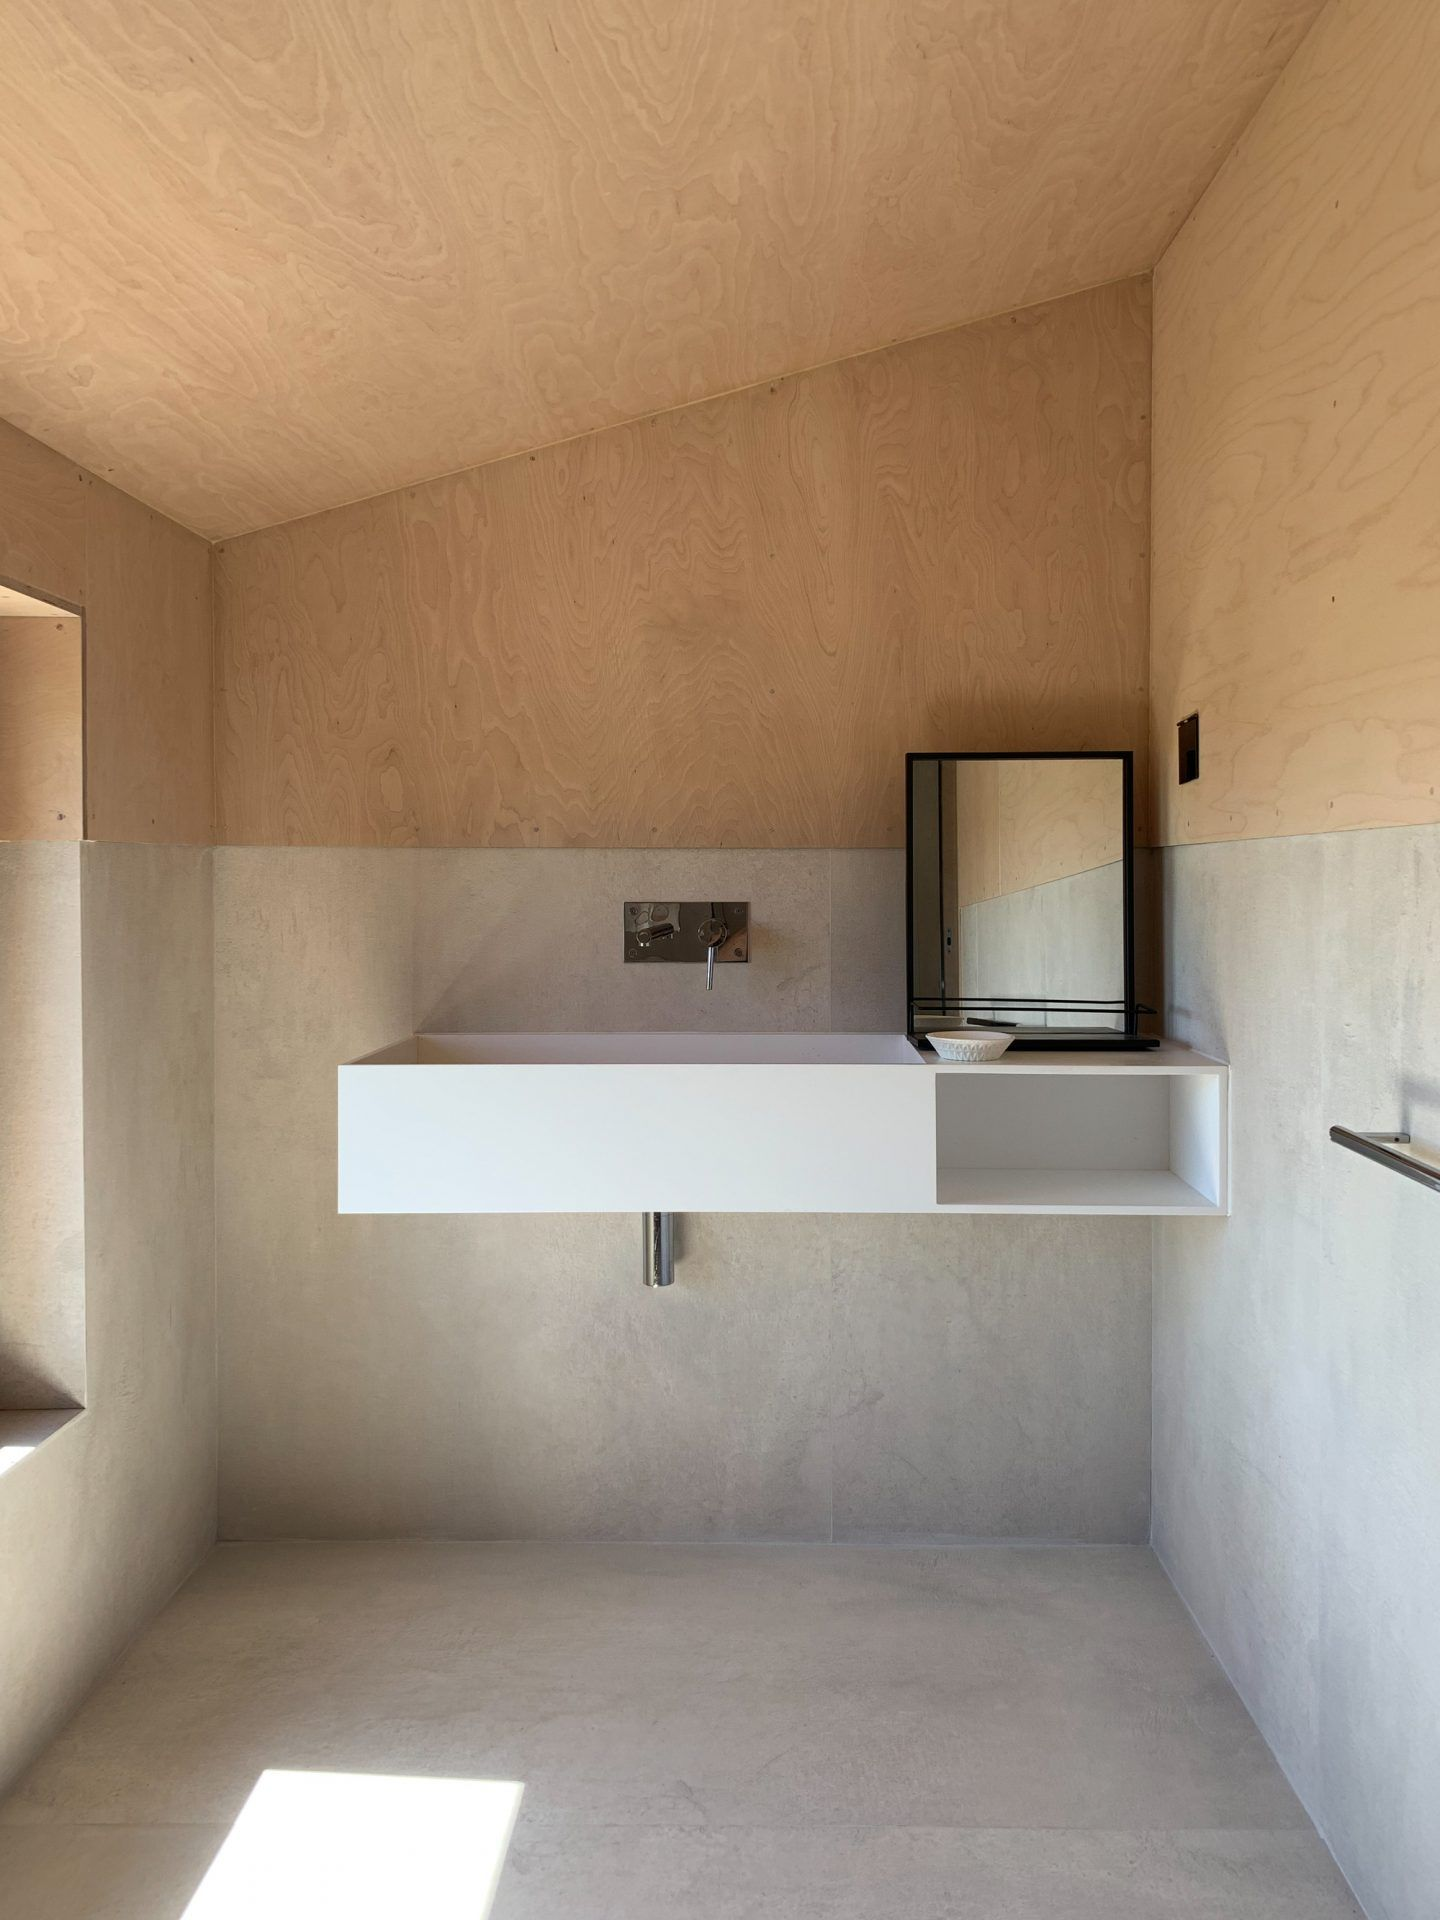 IGNANT-Architecture-Studio-Combo-Houses-Etosoto-19